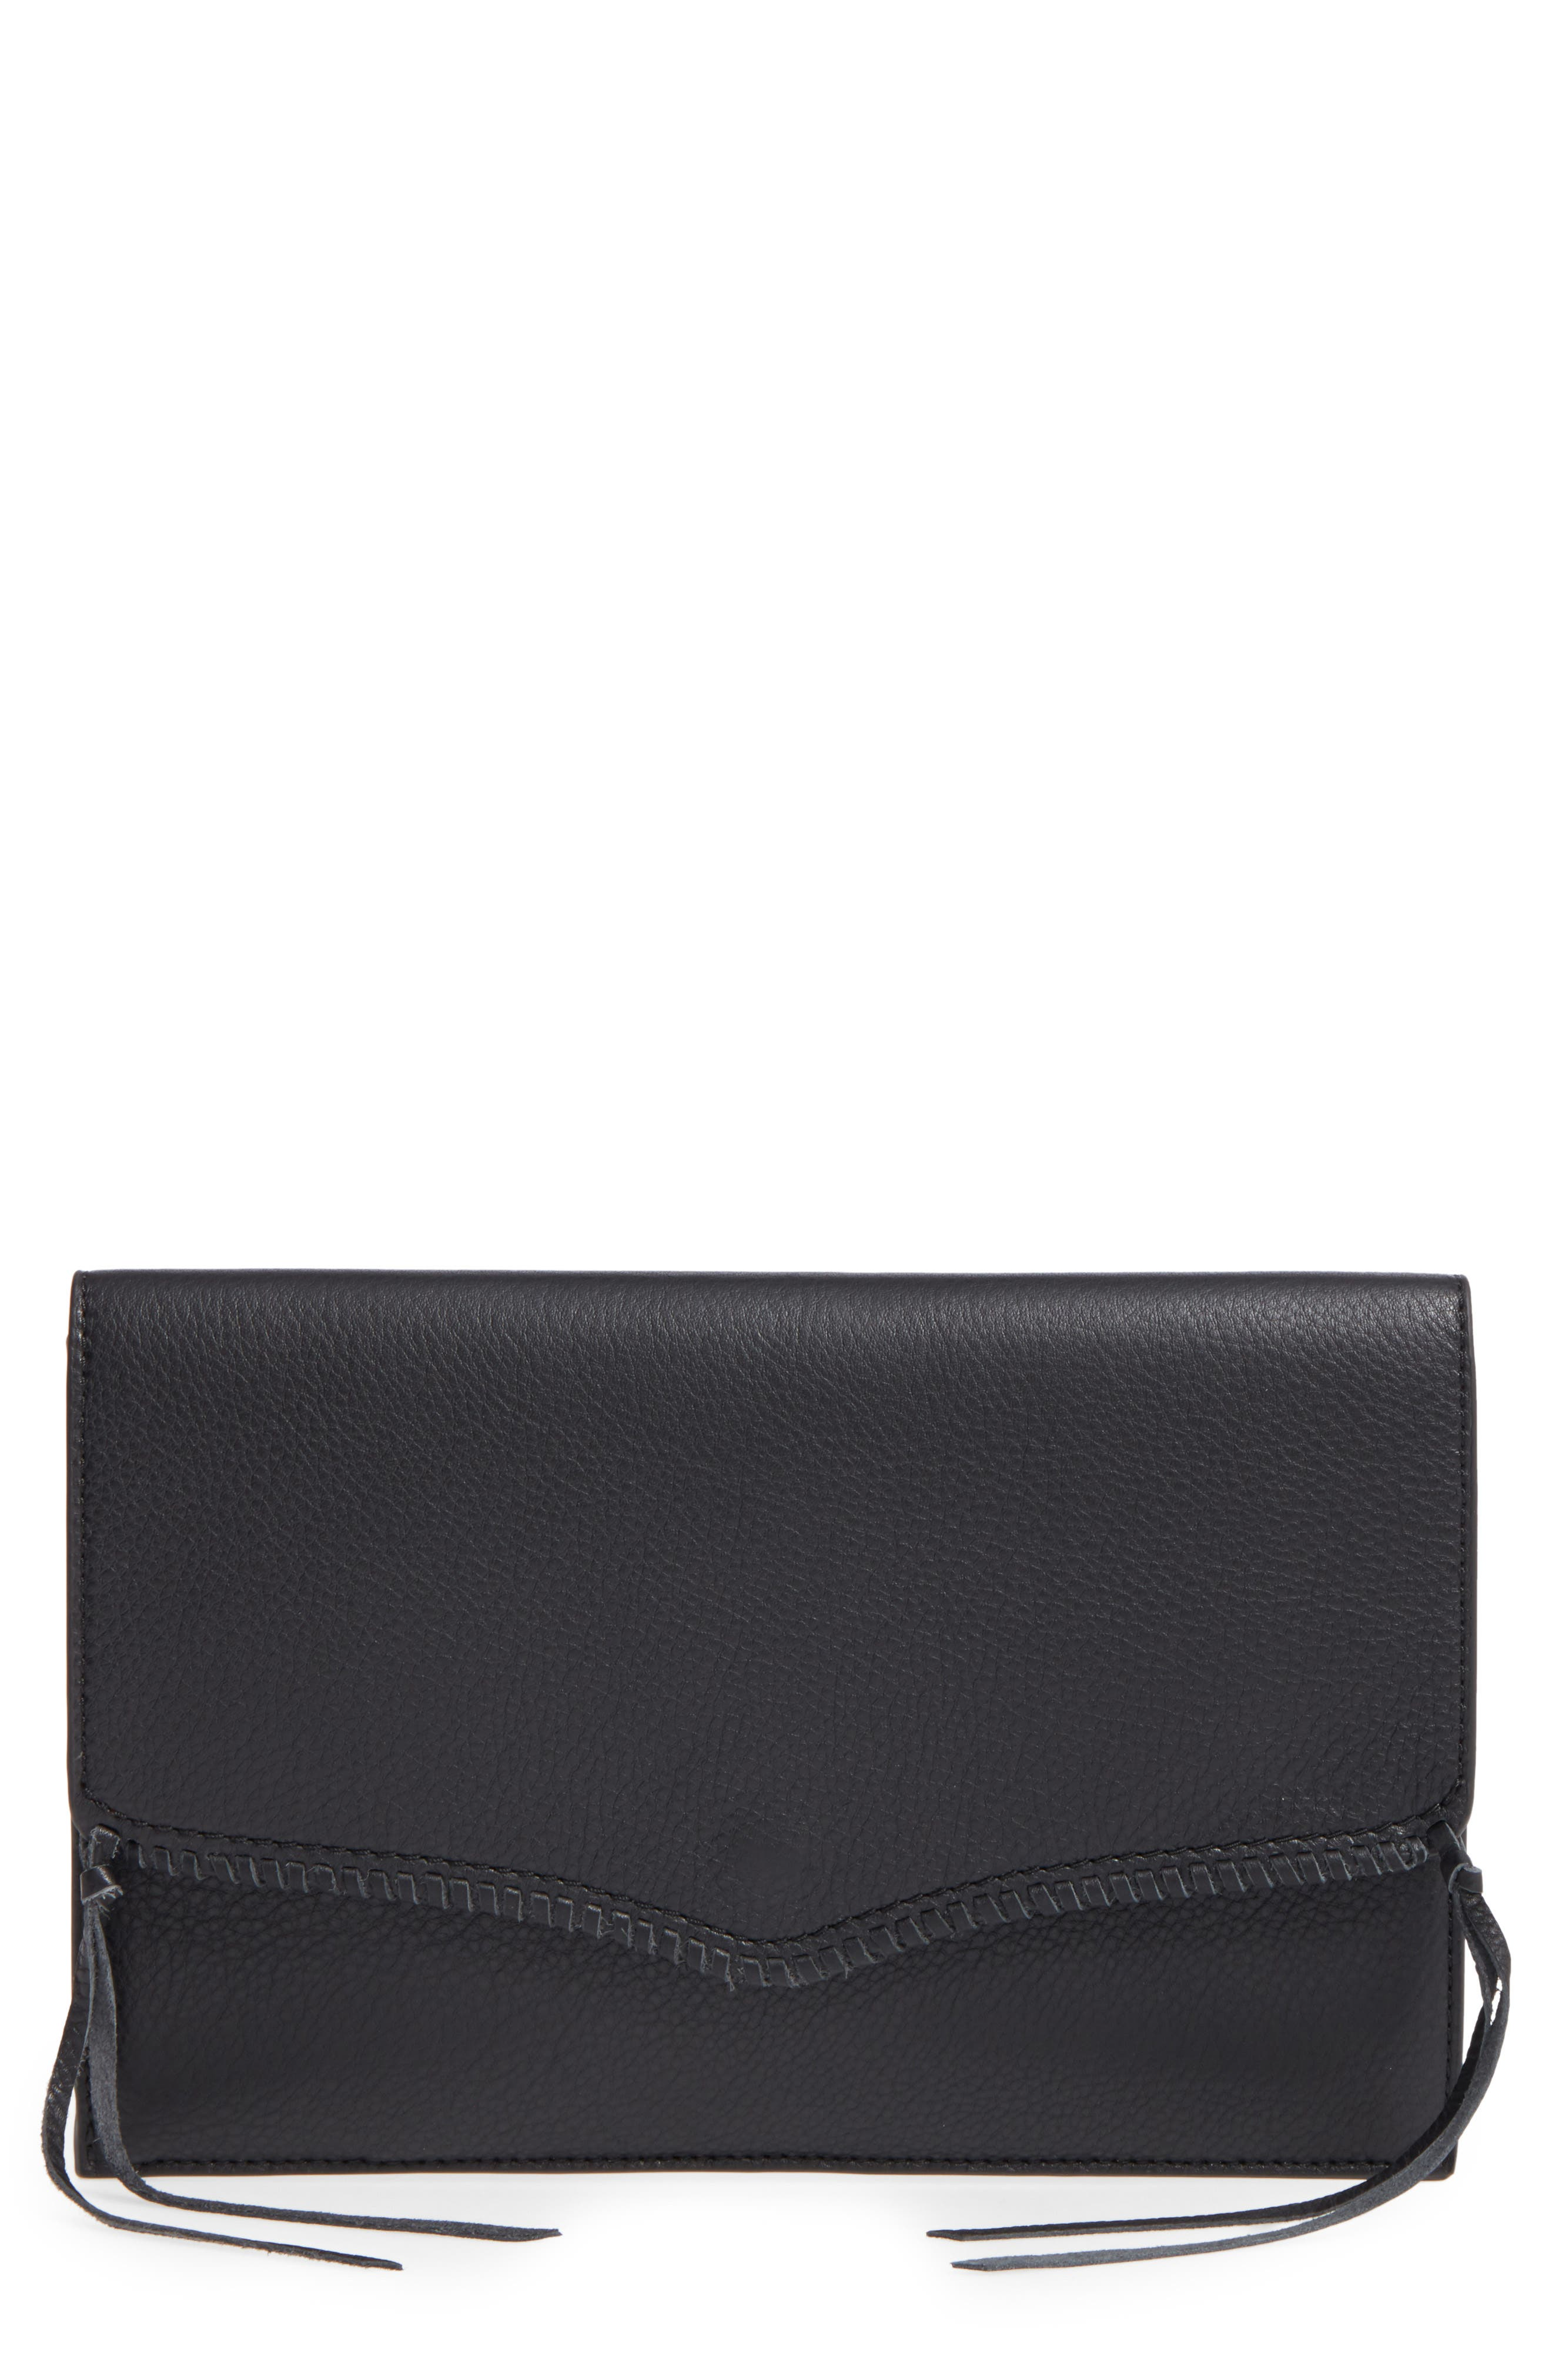 Rebecca Minkoff Panama Leather Envelope Clutch